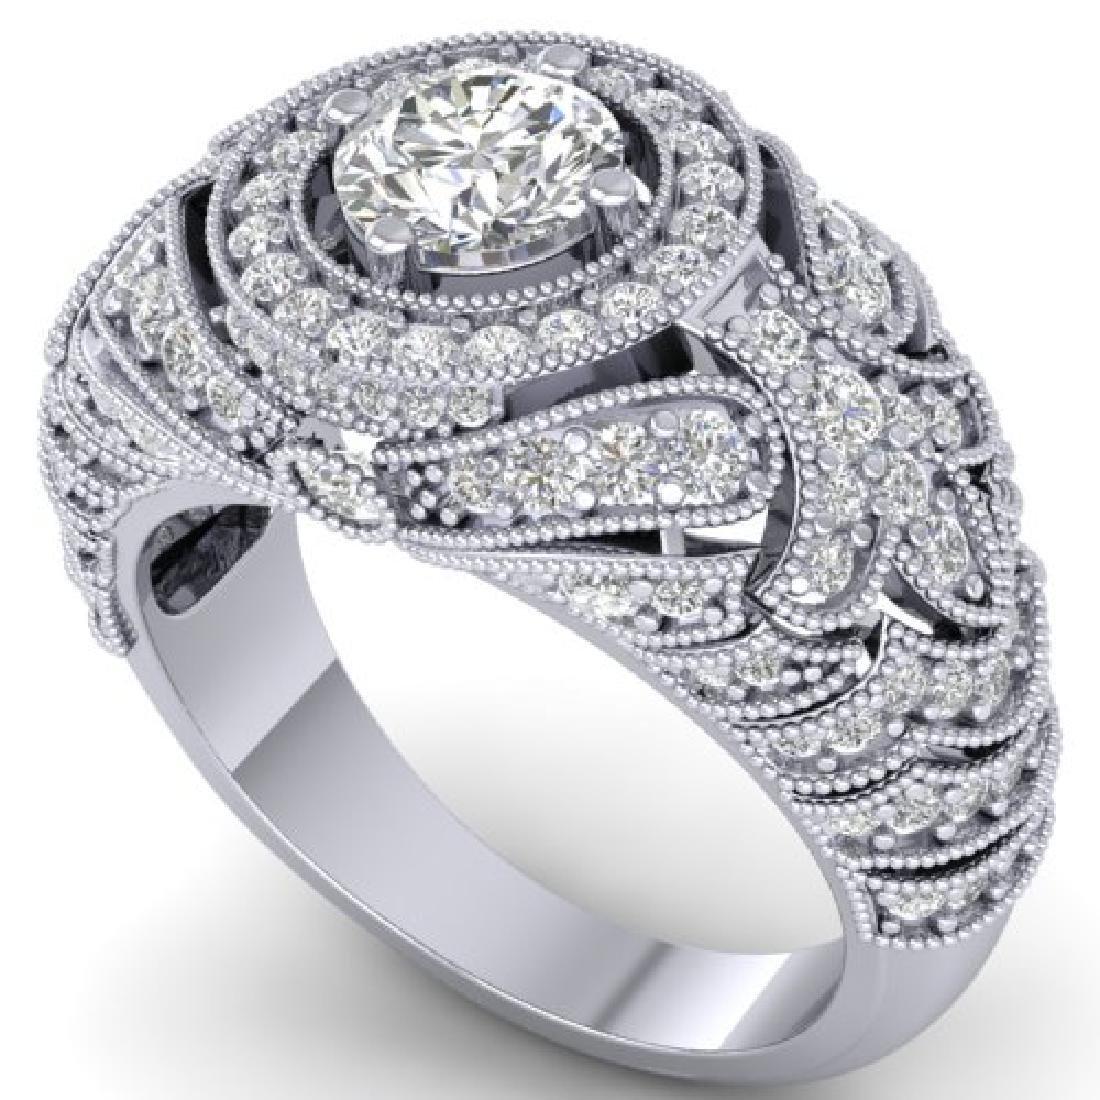 2.35 CTW Certified VS/SI Diamond Art Deco Halo Ring 18K - 2